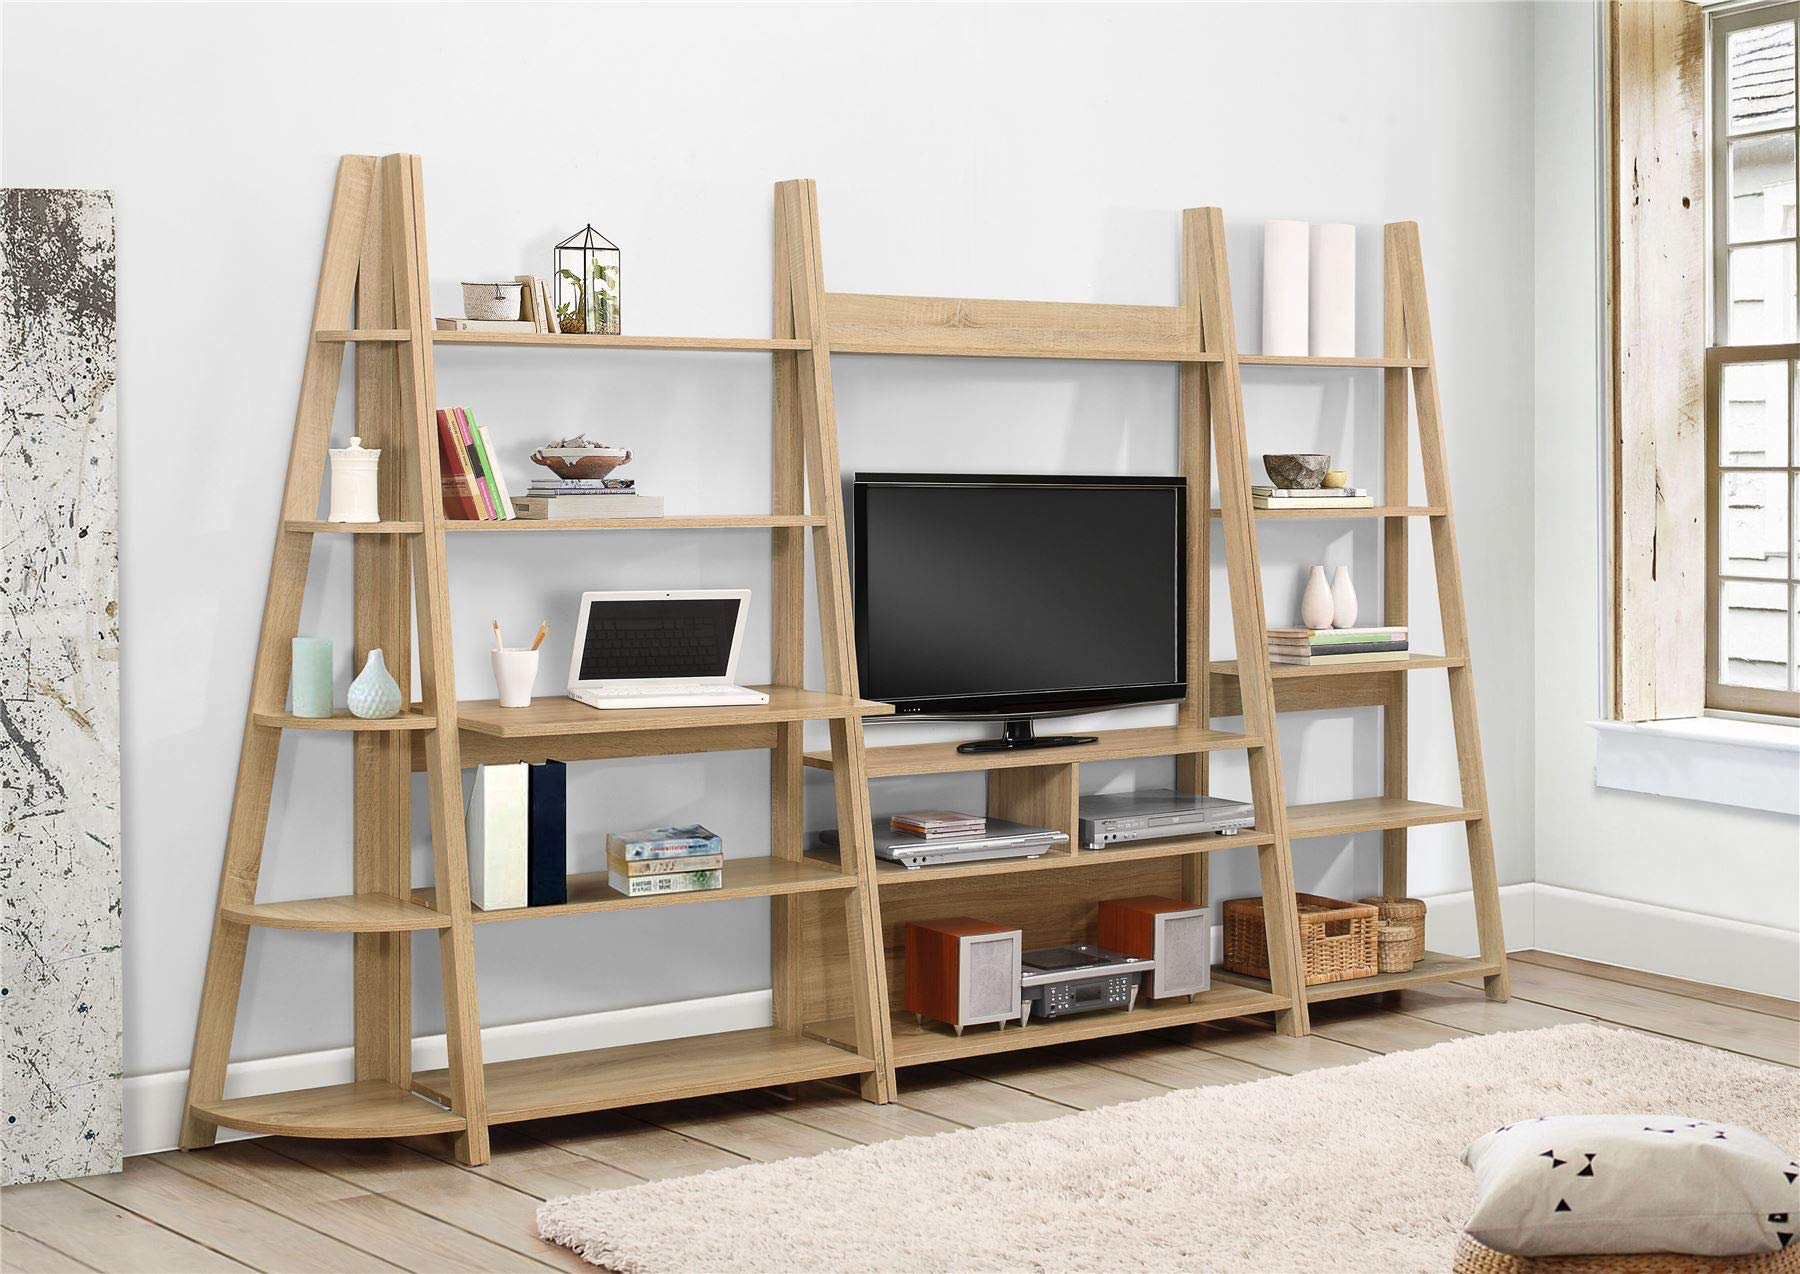 81fp606jAhL - Birlea, Dayton, Ladder Bookcase, Wood, Oak, One Size